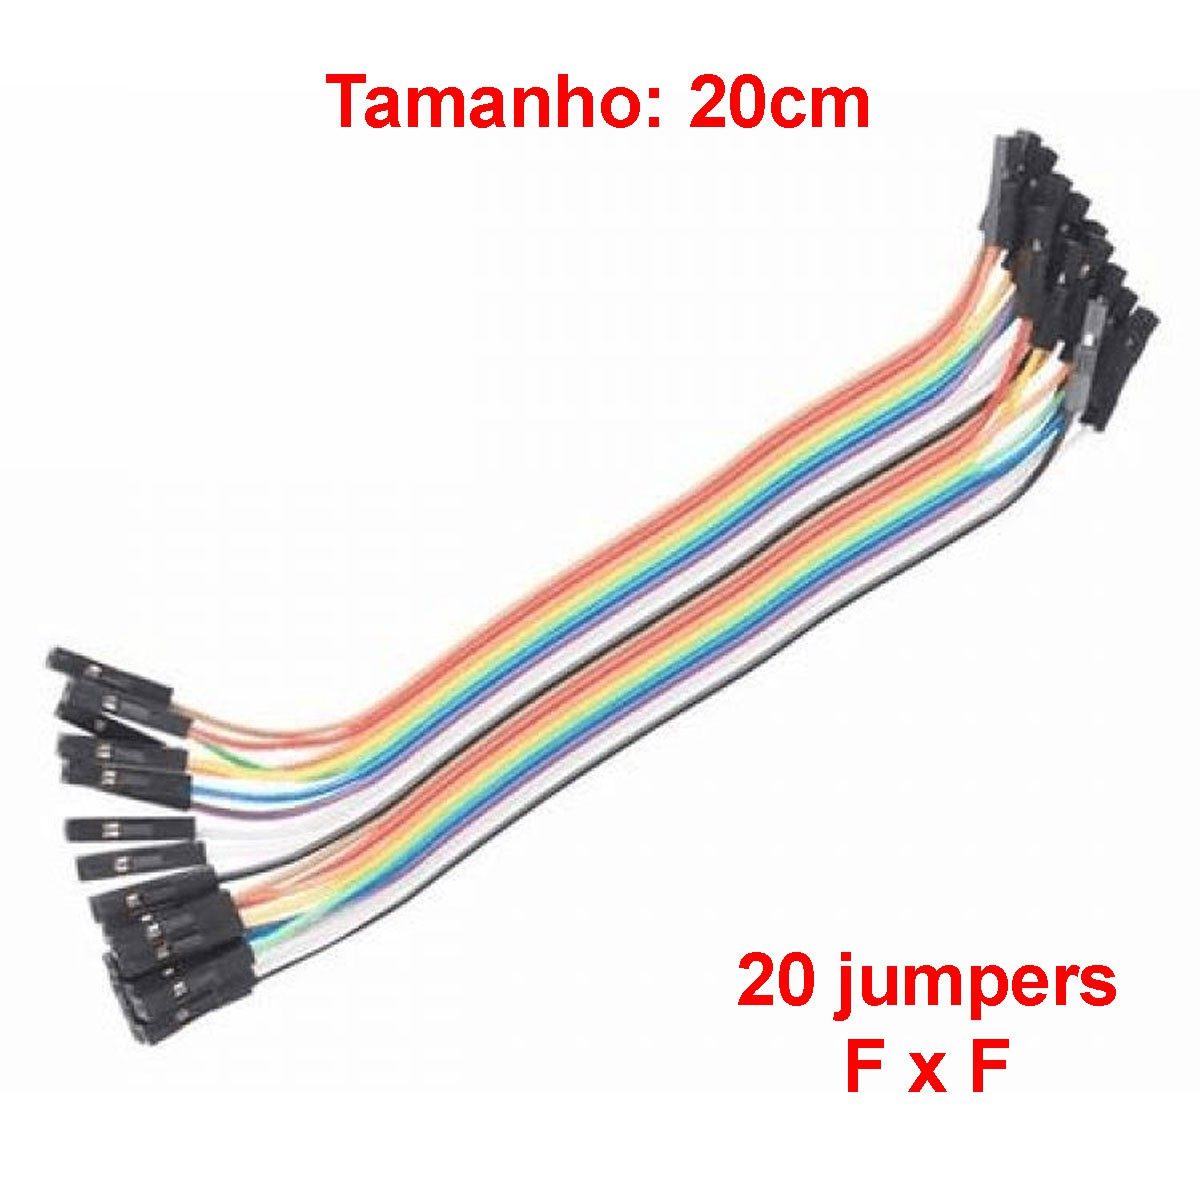 20x Cabo Jumper Fêmea x Fêmea 20 cm